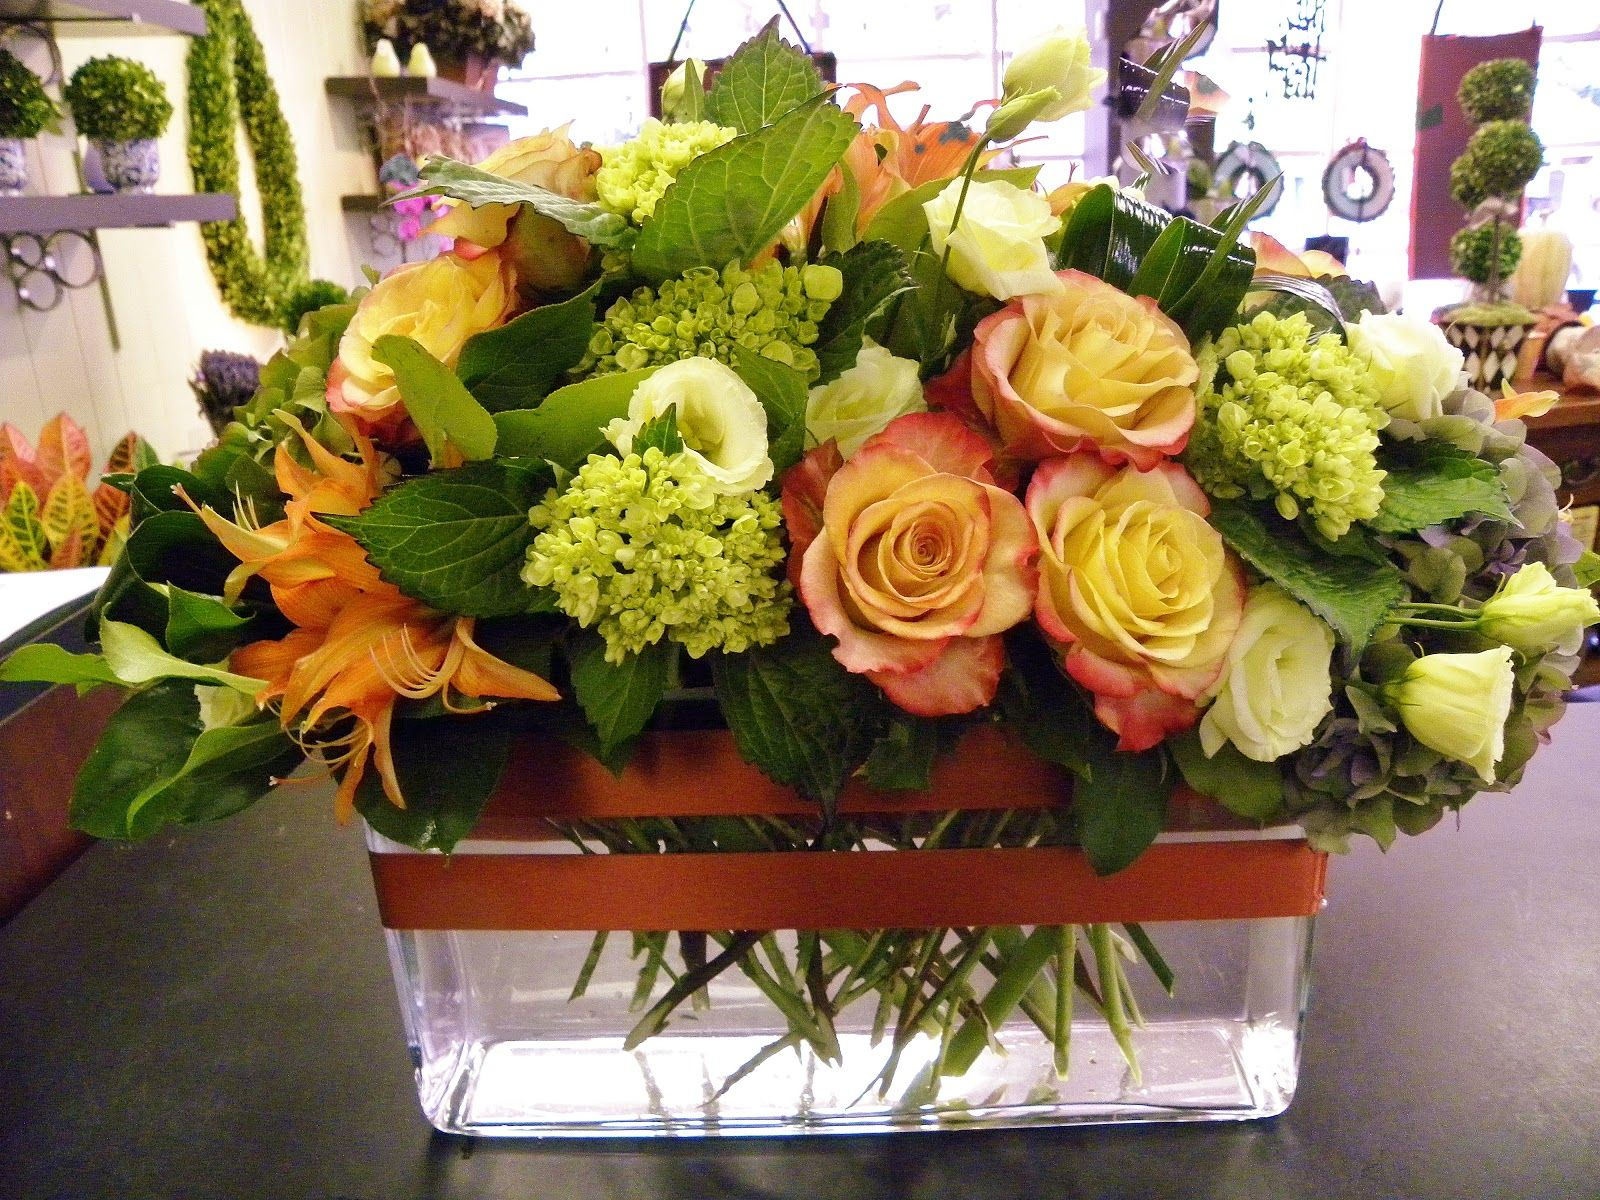 Flower Arrangements For Dining Room Tables